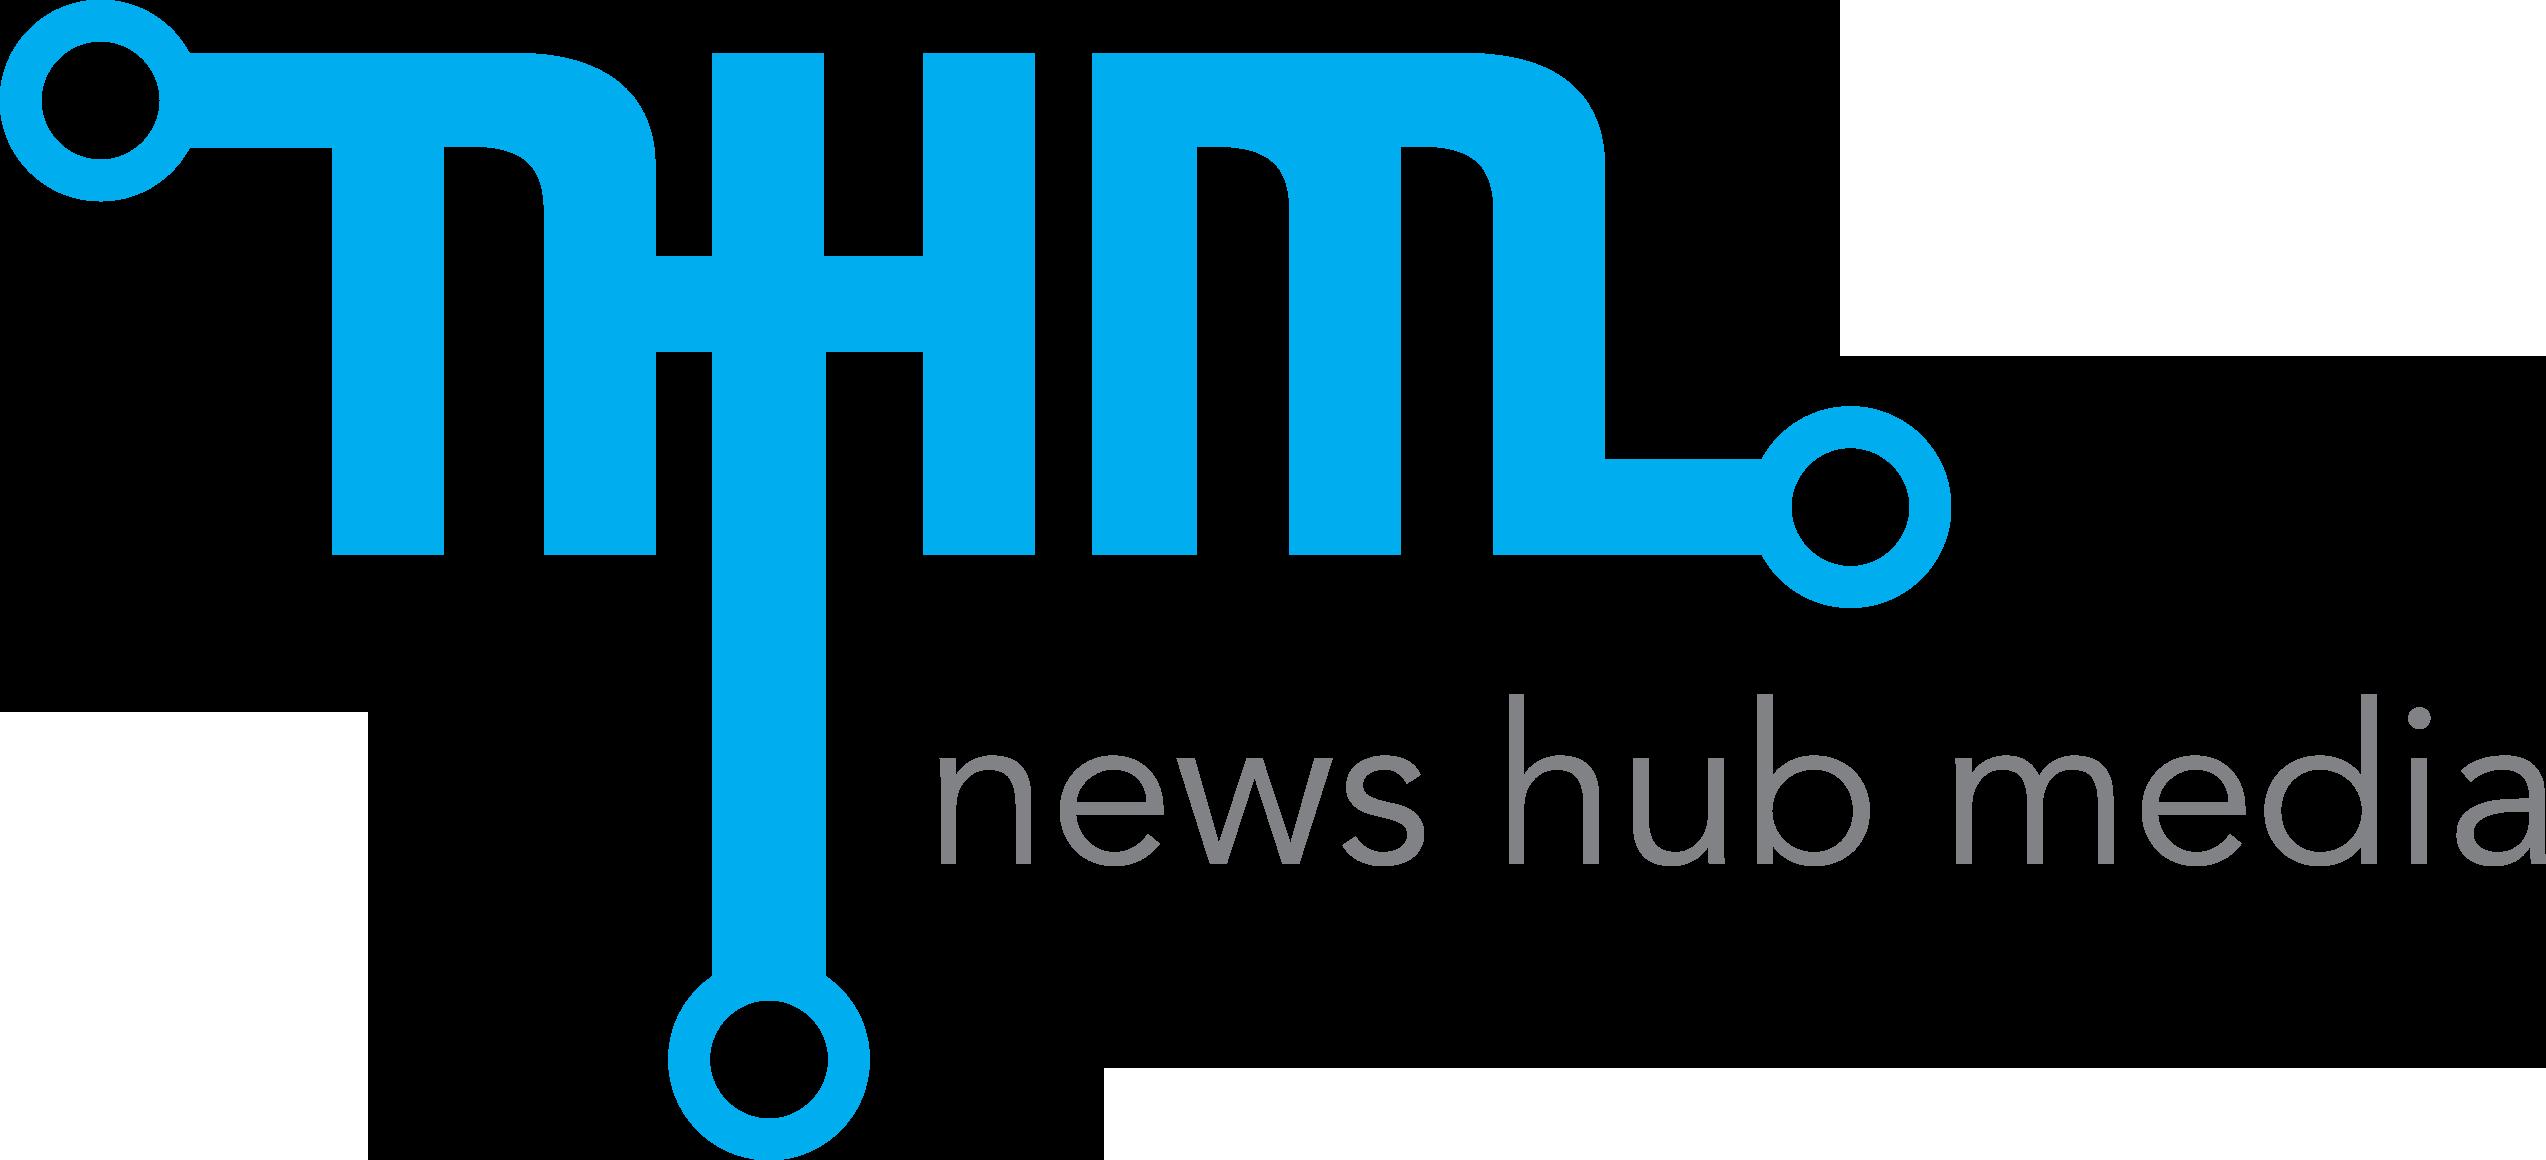 news hub media